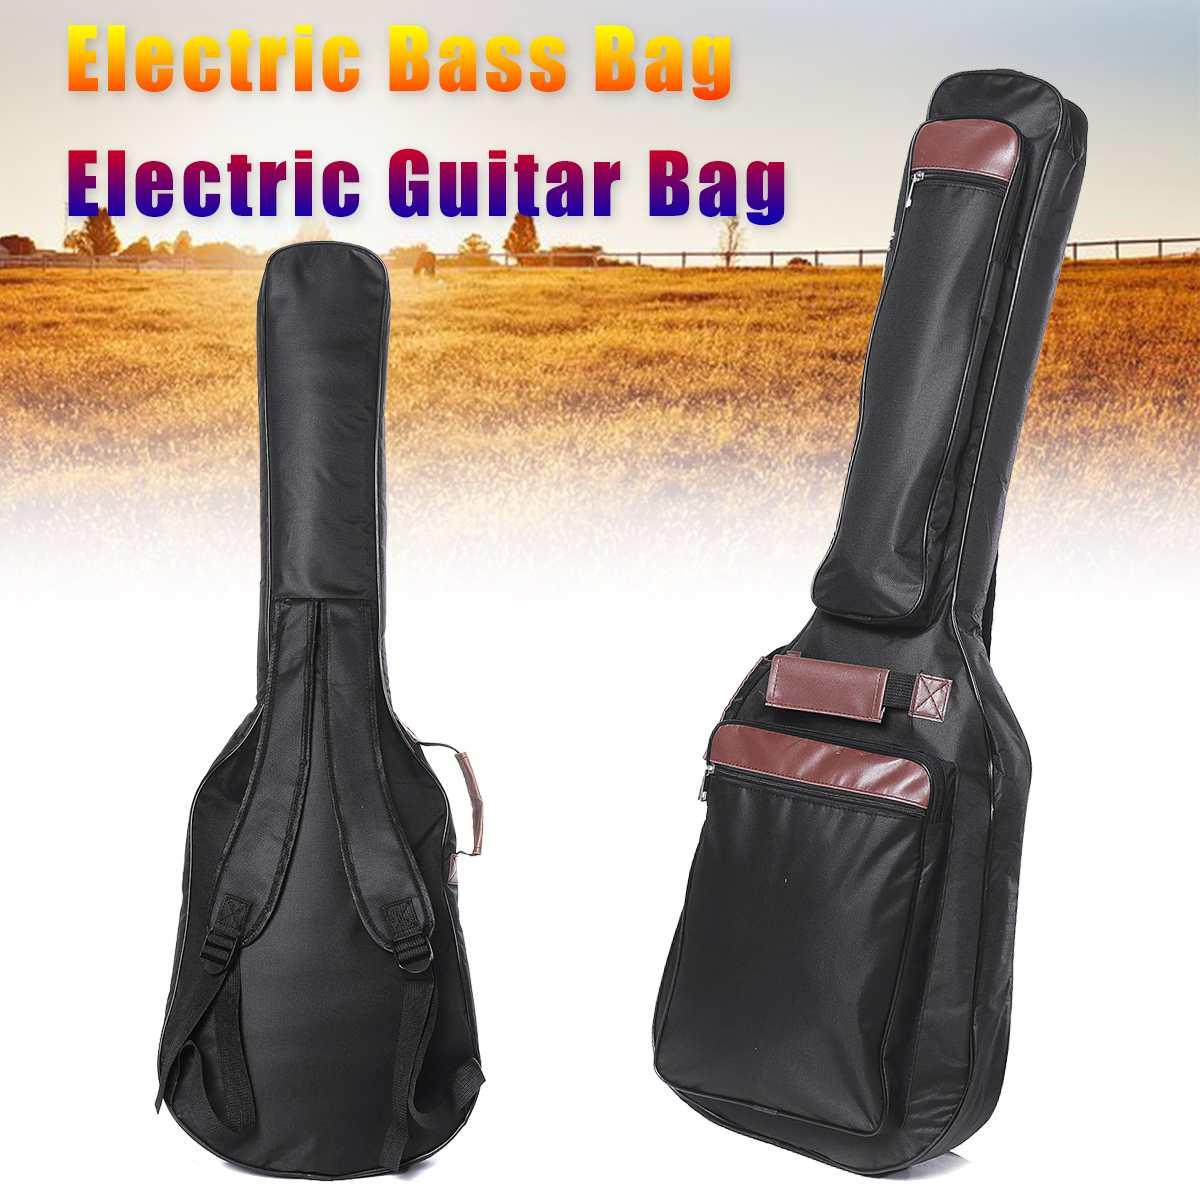 Guitar Backpack Double Shoulder Straps Pockets Waterproof Electric Guitar Bag Electric Bass Bag 8mm Thicken Padded Gig Bag Case